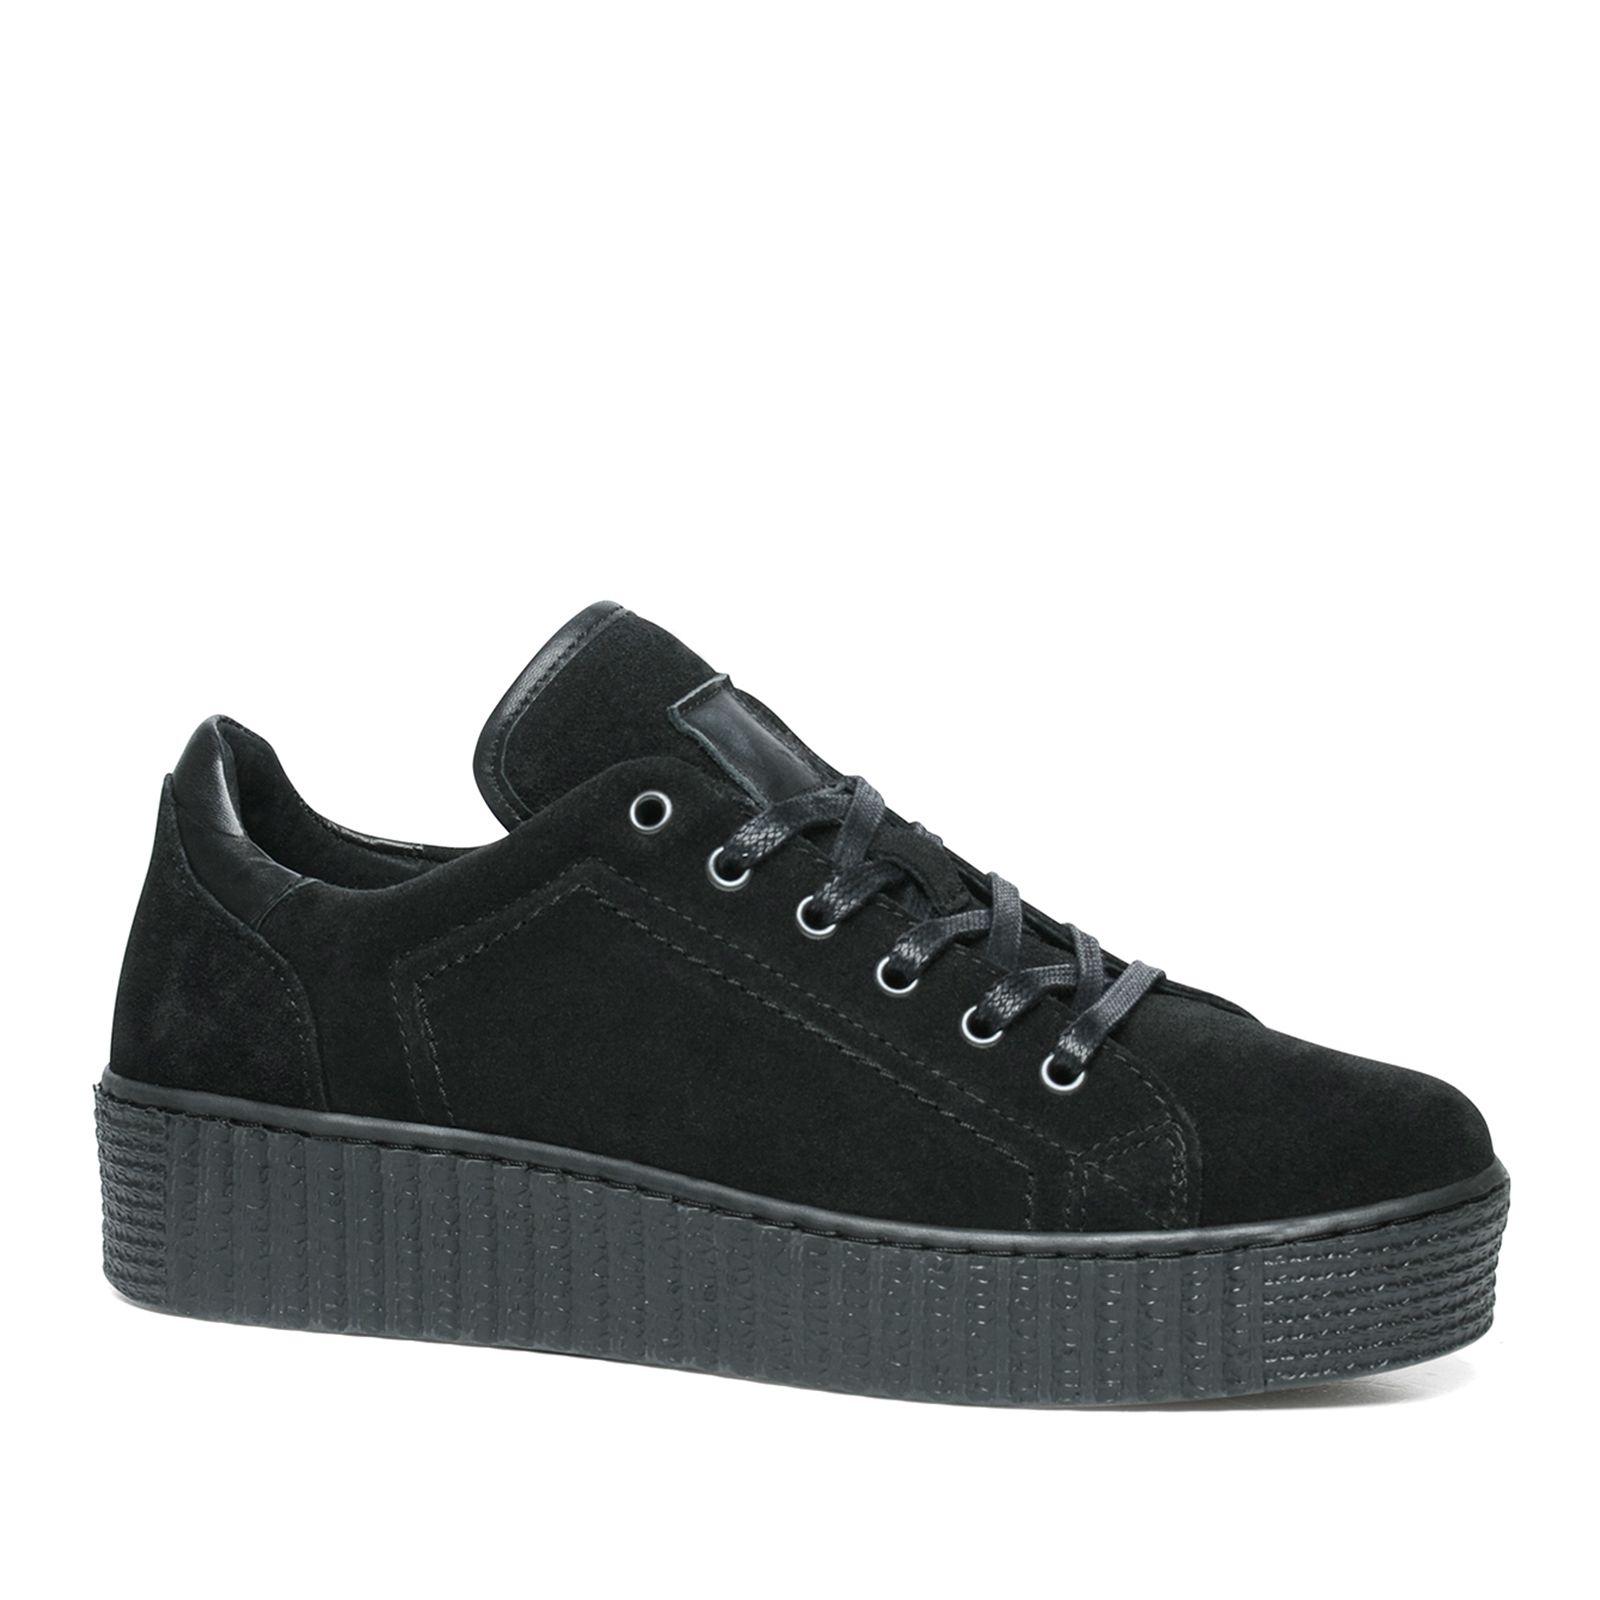 sneakers met zwarte zool